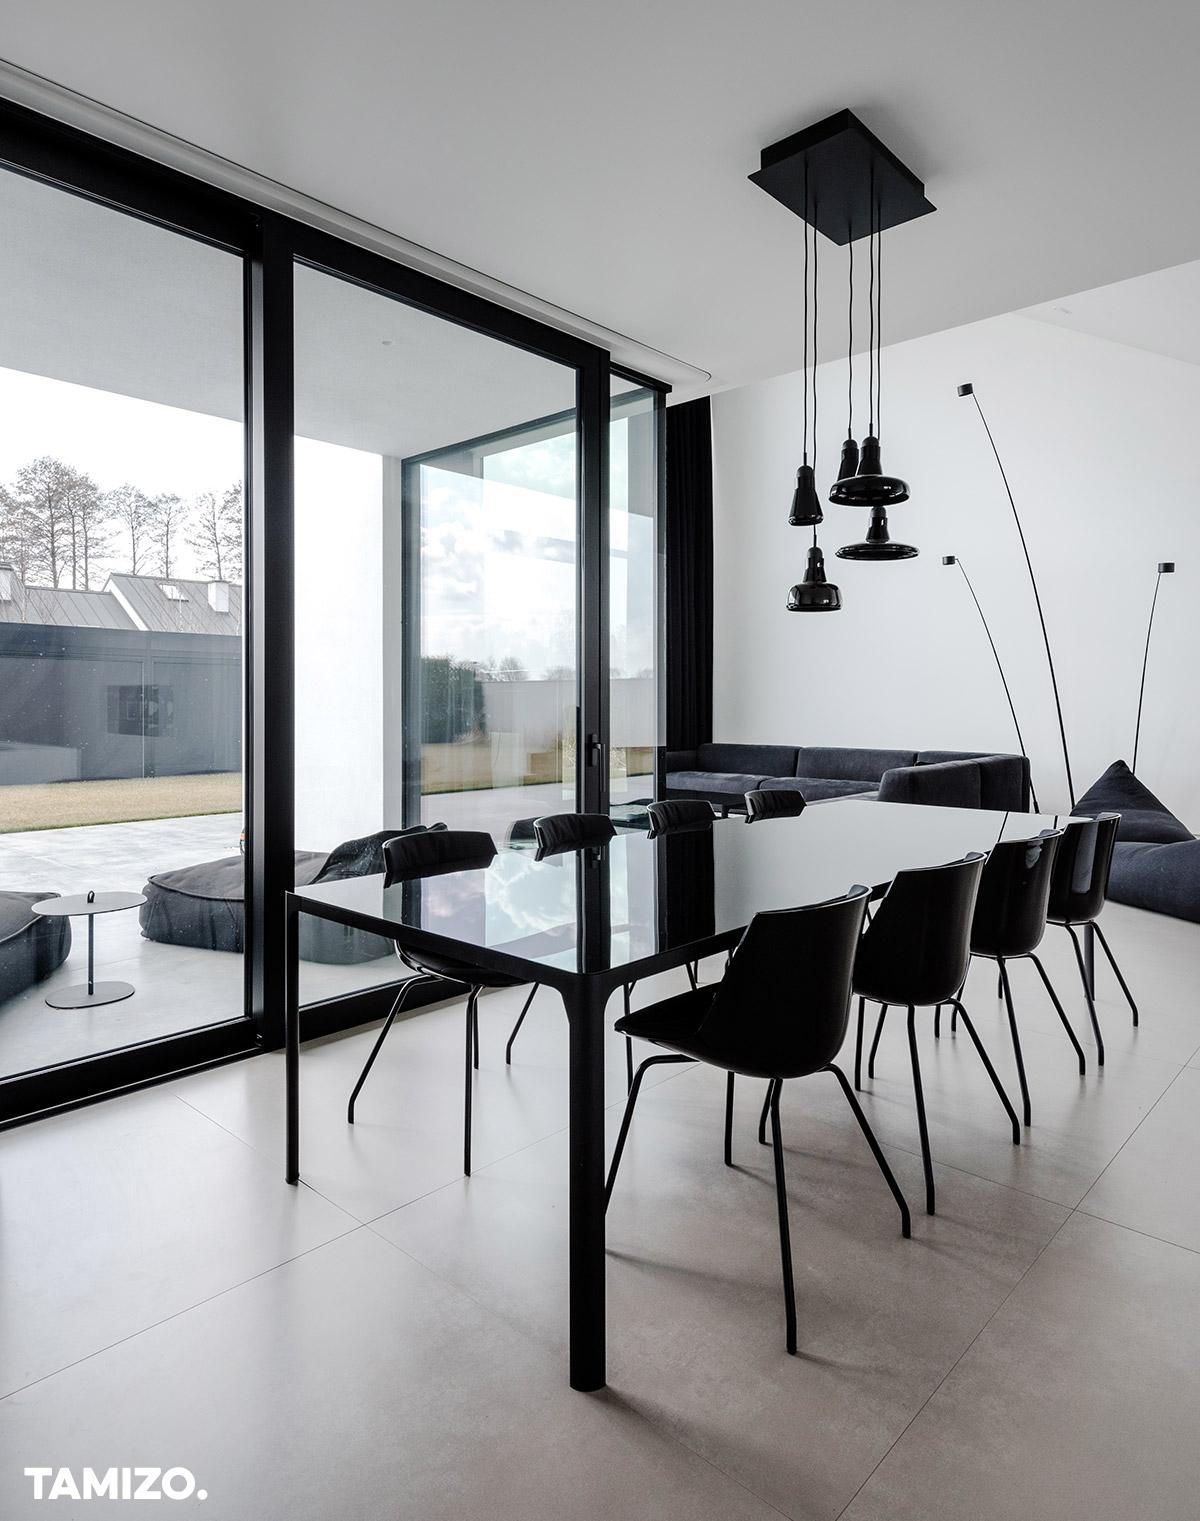 016_tamizo_architects_interior_house_realization_warsaw_poland_21